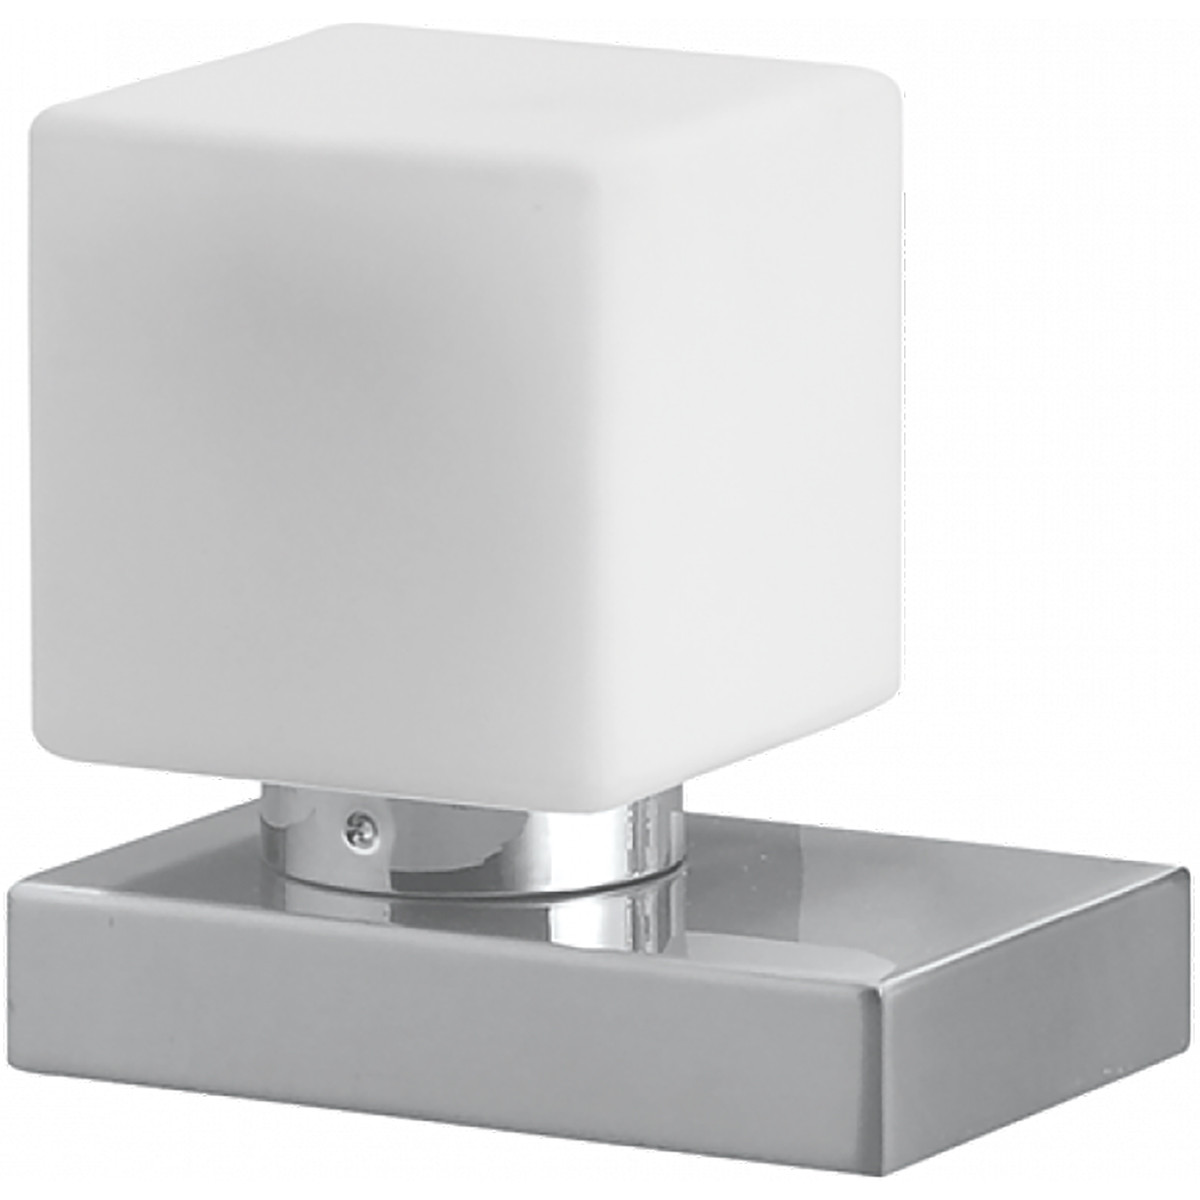 LED Tafellamp - Trion Tira - E14 Fitting - Dimbaar - Rechthoek - Mat Nikkel - Aluminium